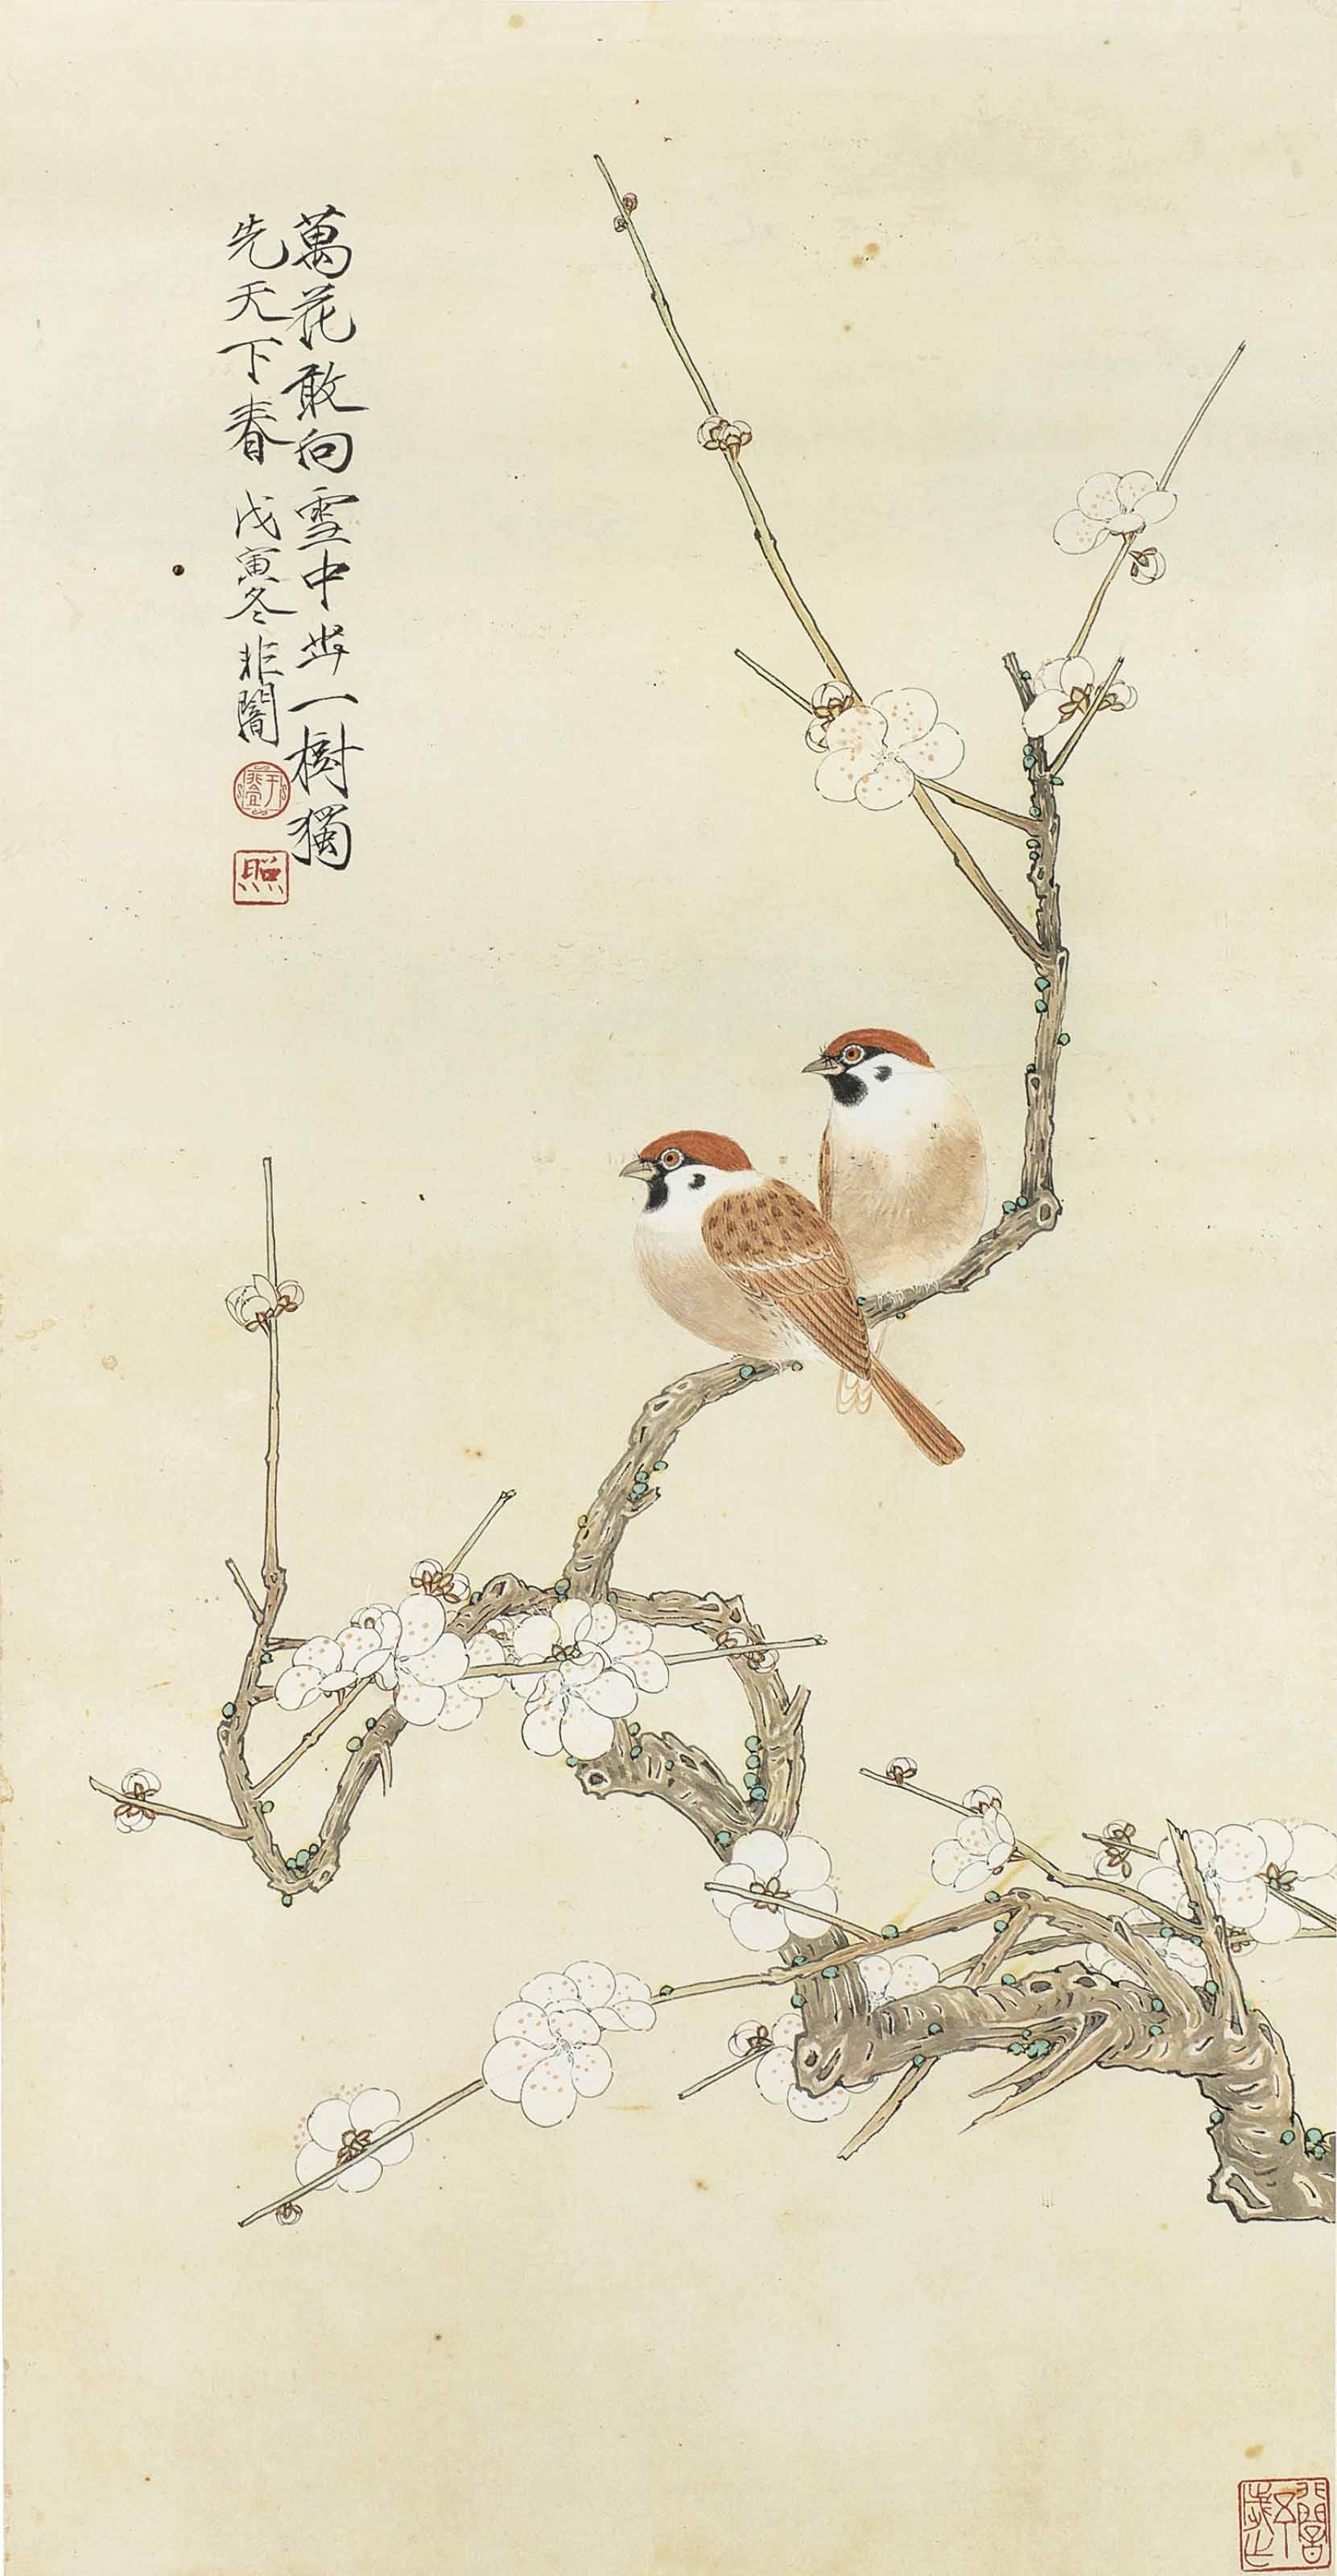 Pair of Birds on Plum Blossom Branch